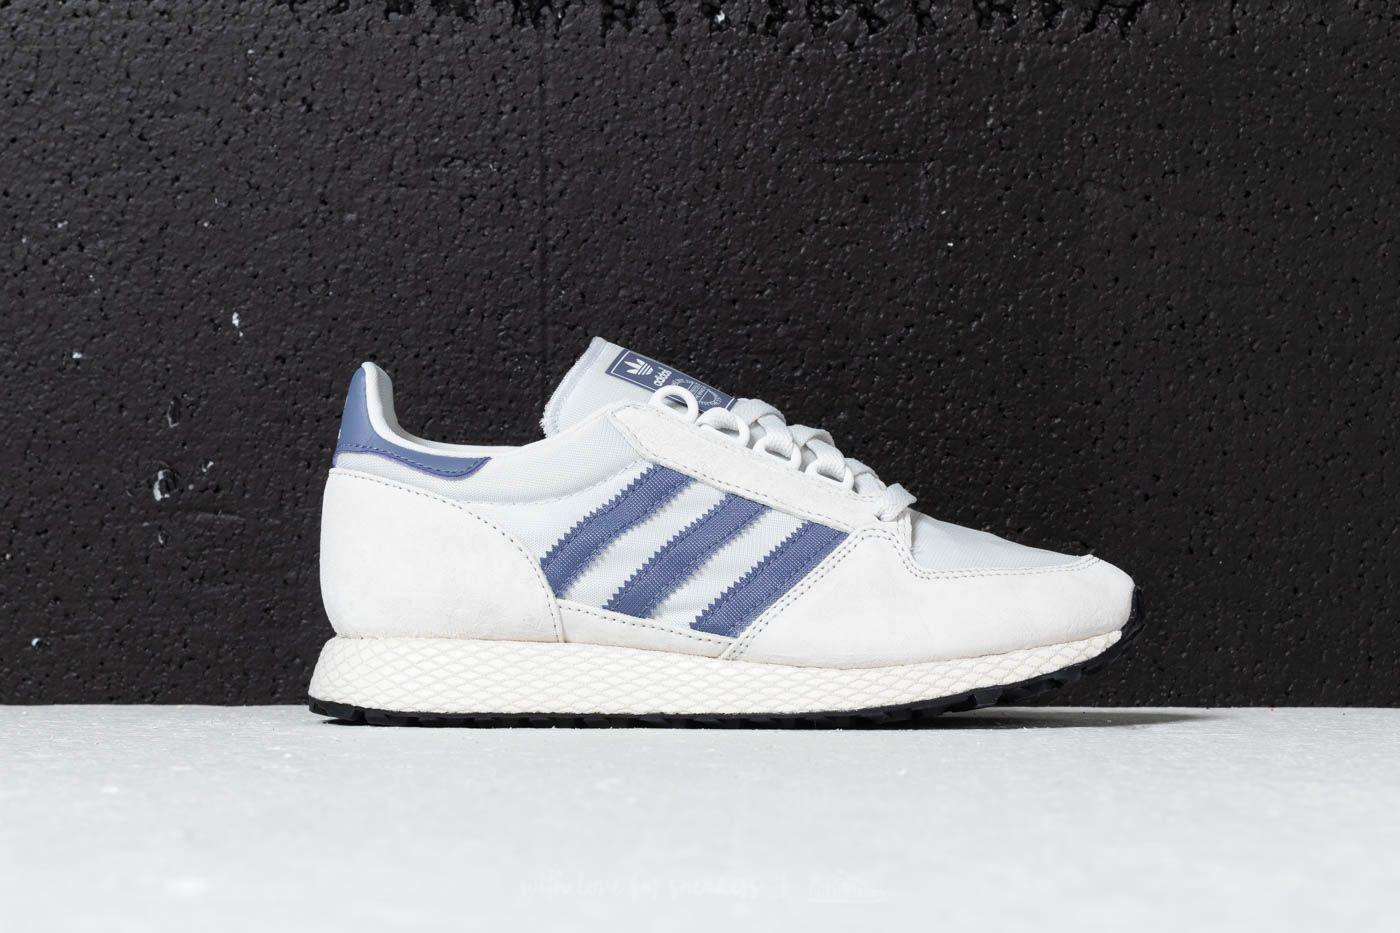 buy popular 647ce d9d3e Lyst - adidas Originals Adidas Forest Grove W Crystal White